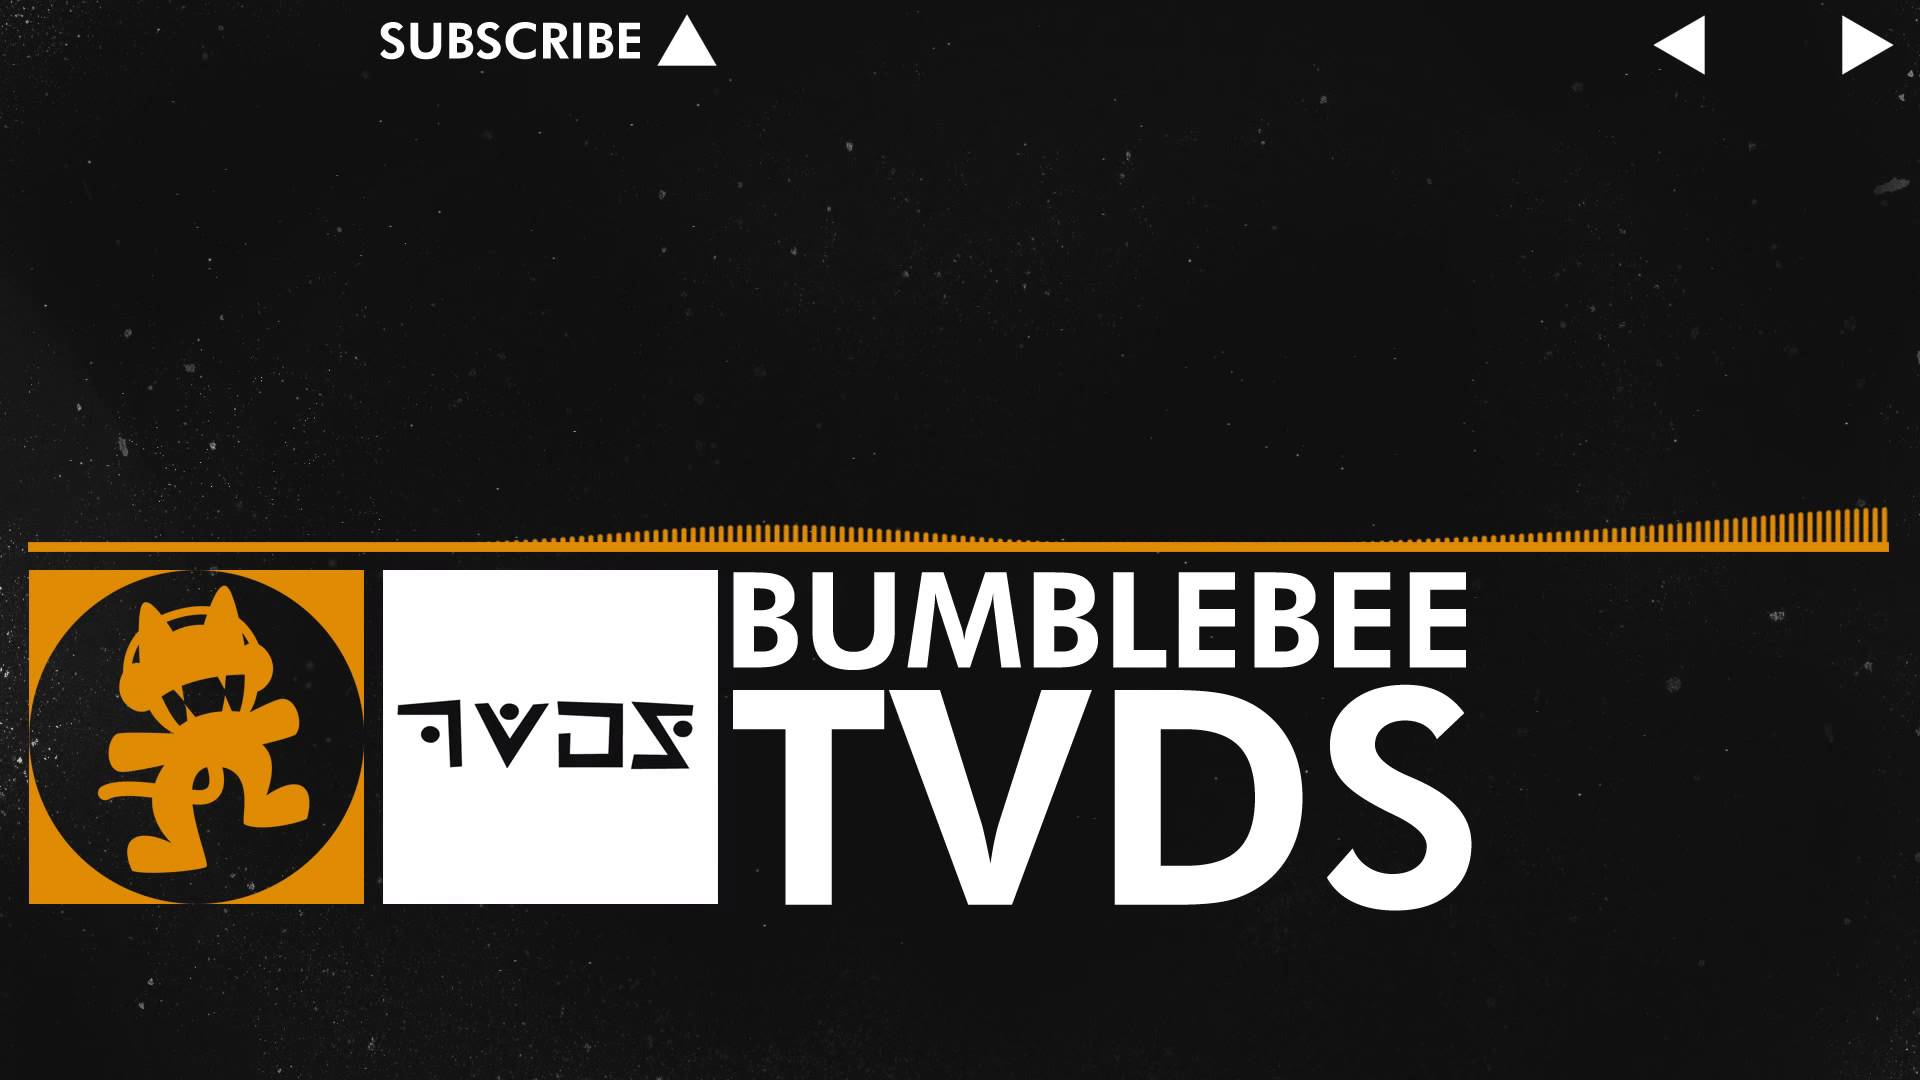 [House] - TVDS - Bumblebee [Monstercat Release]